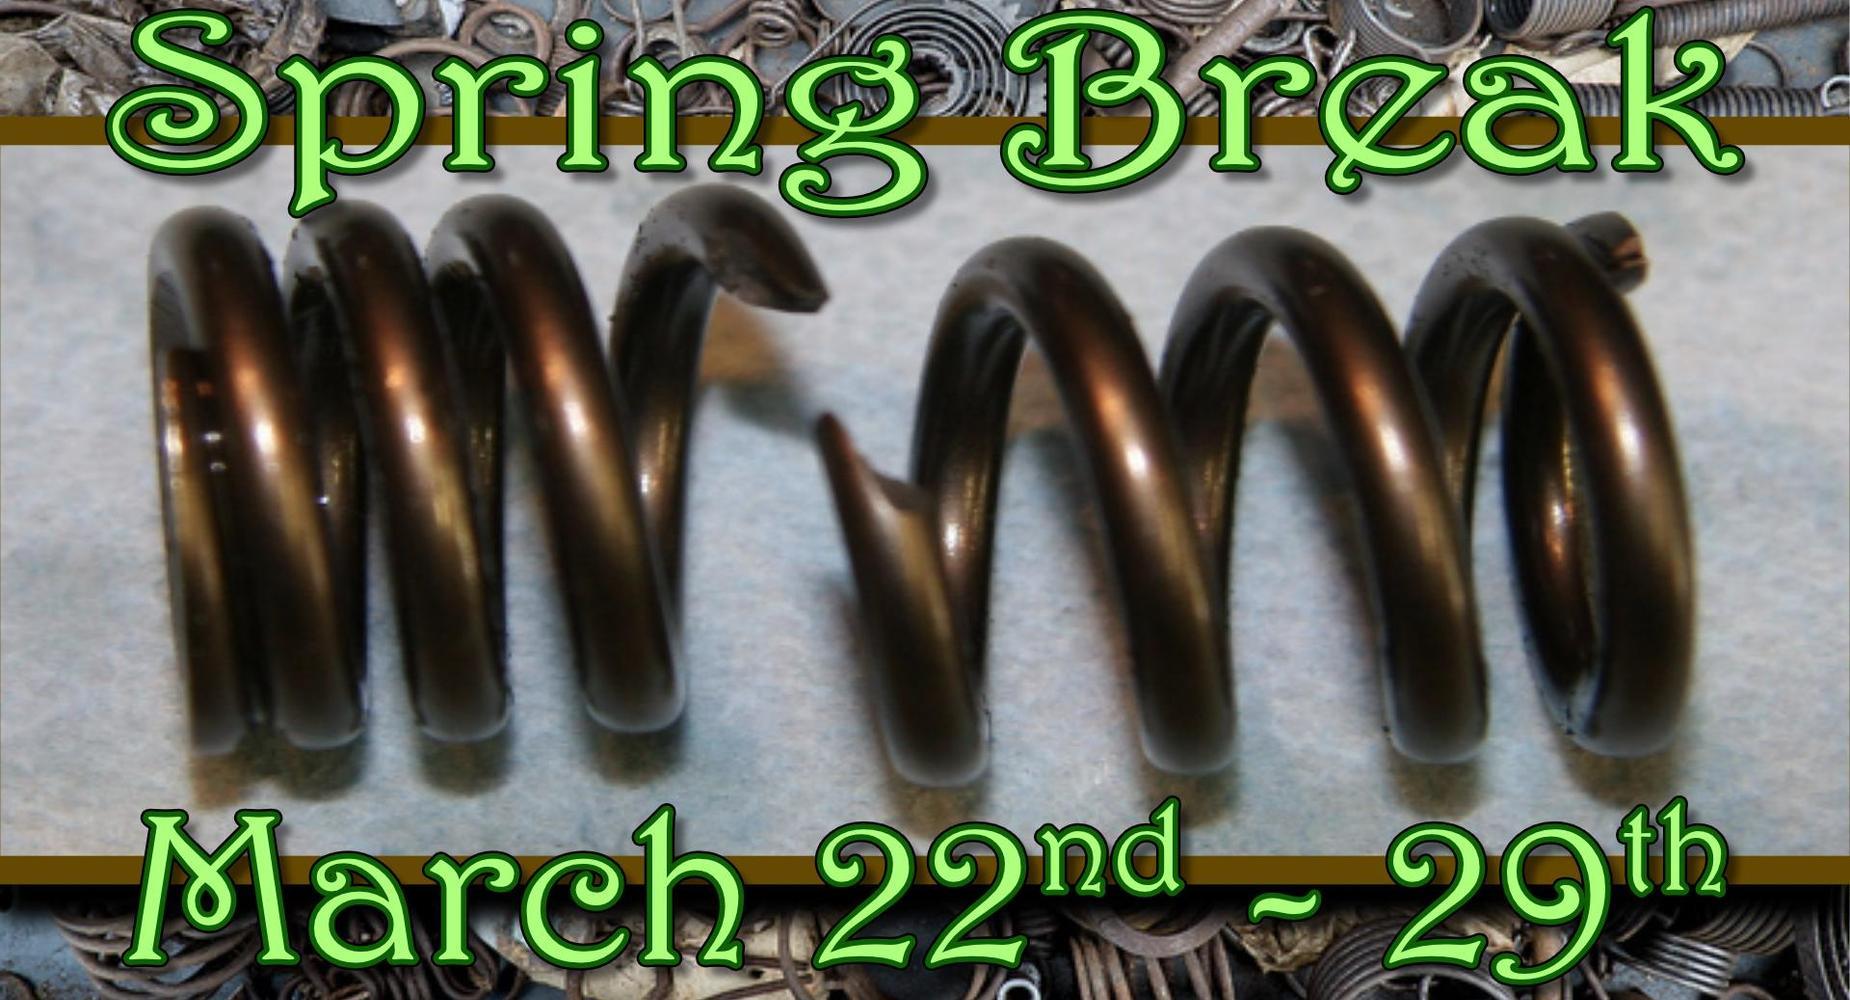 Spring Break - March 22 - 29